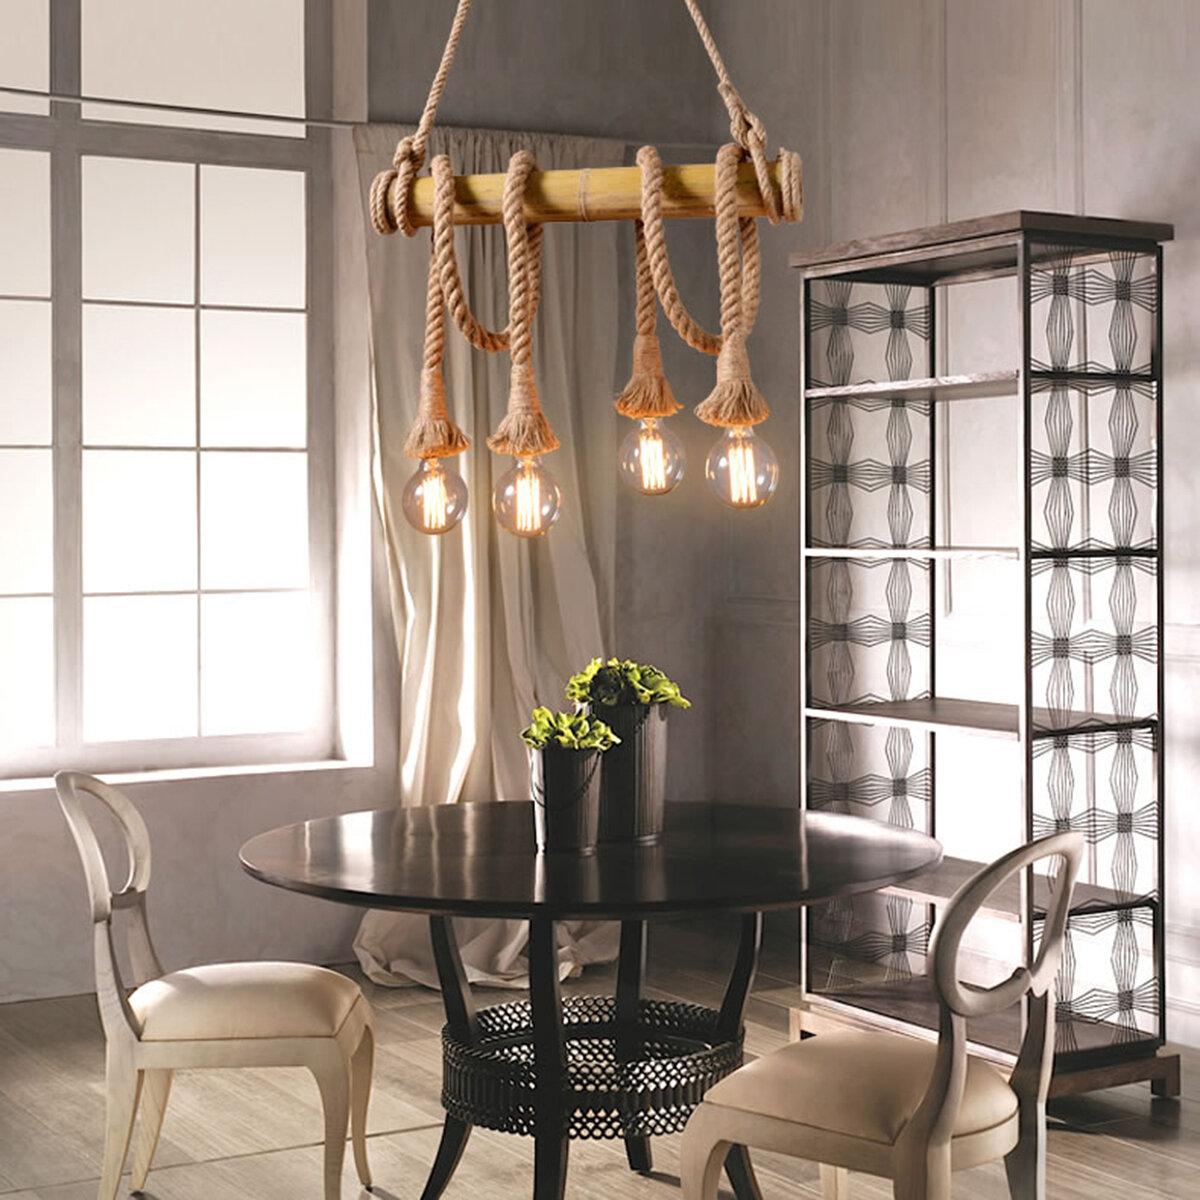 4 Head Industrial Retro Country Hemp Rope Ceilin Chandelier Pendant Light Edison Lamp